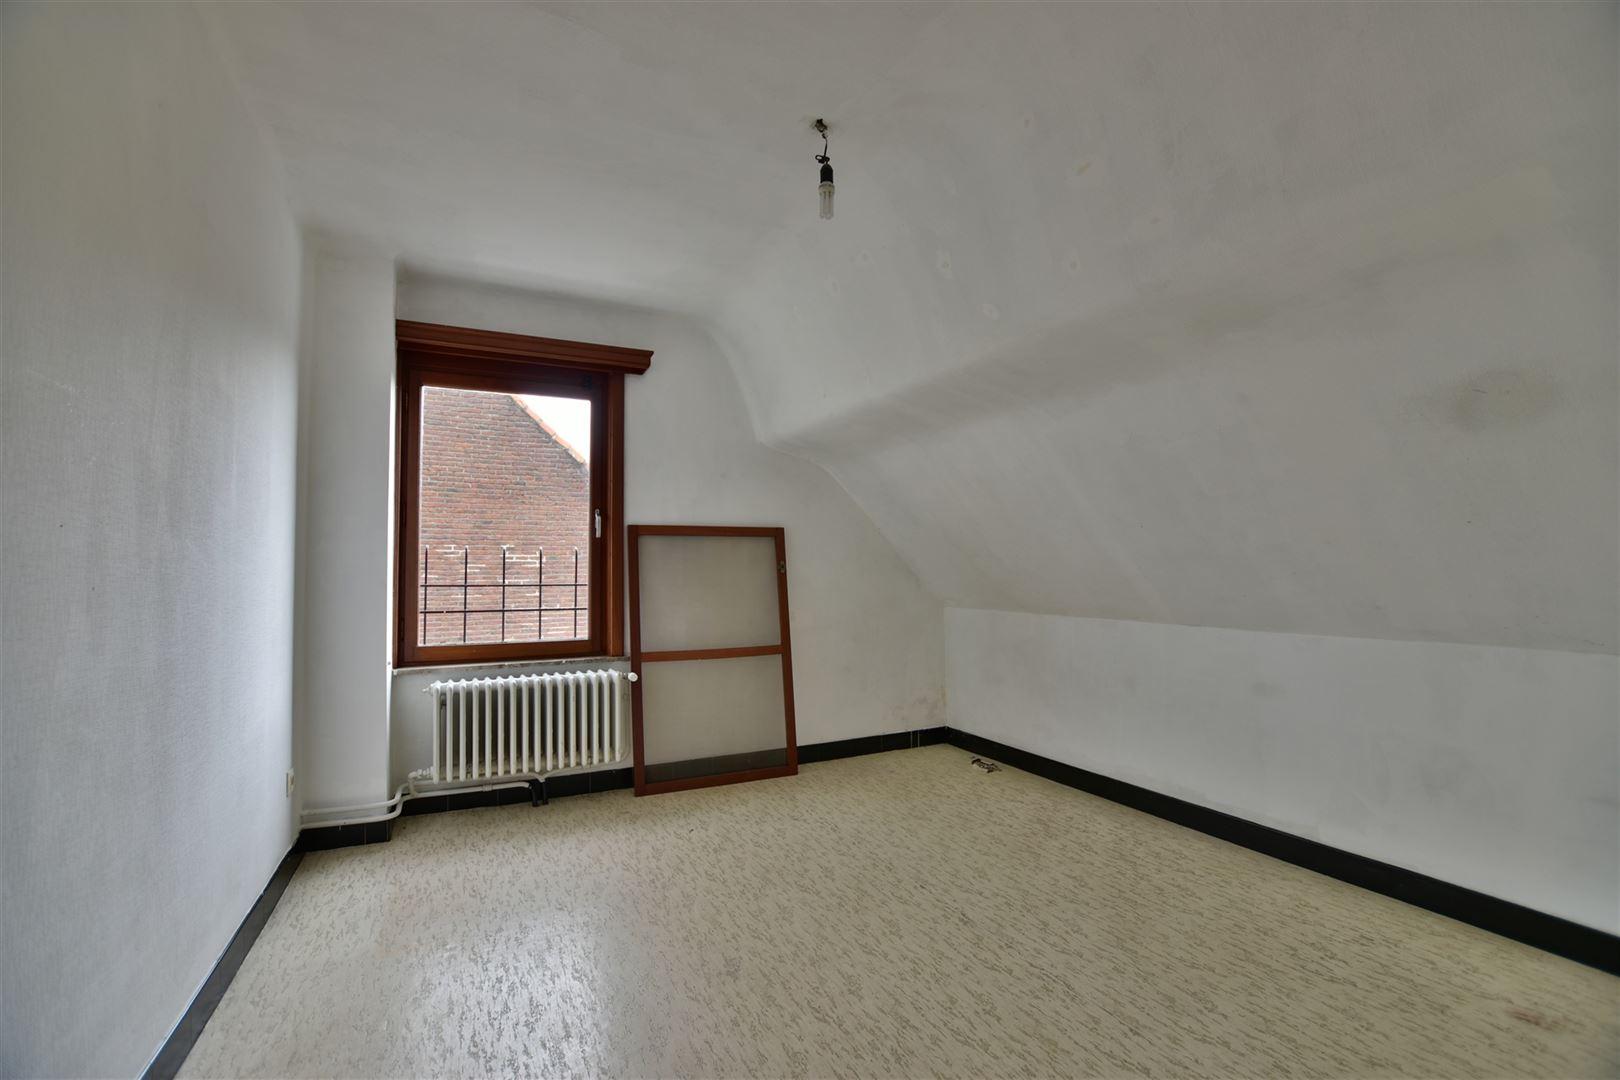 Foto 17 : Woning te 9100 SINT-NIKLAAS (België) - Prijs € 349.000